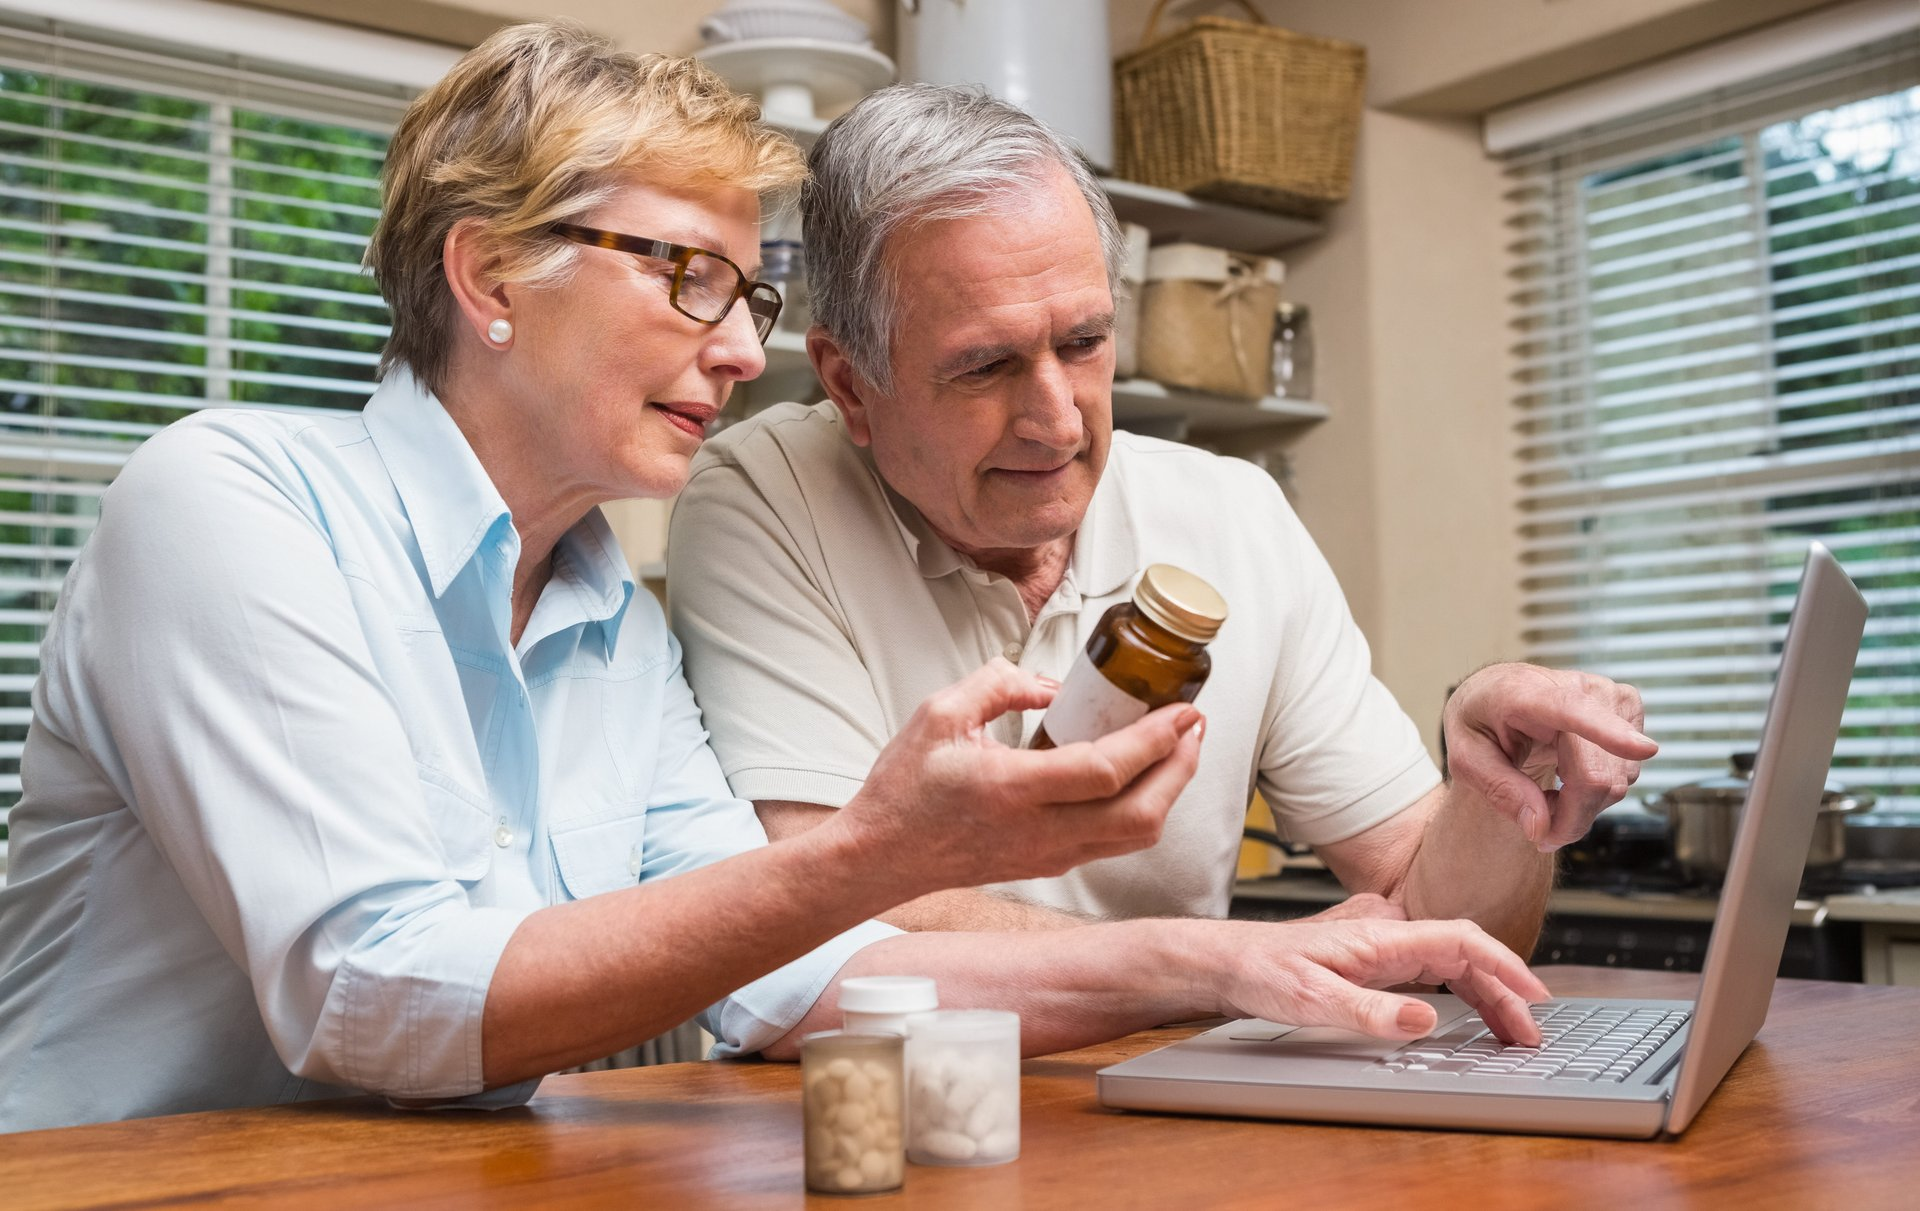 Couple looking at prescription drug bottles